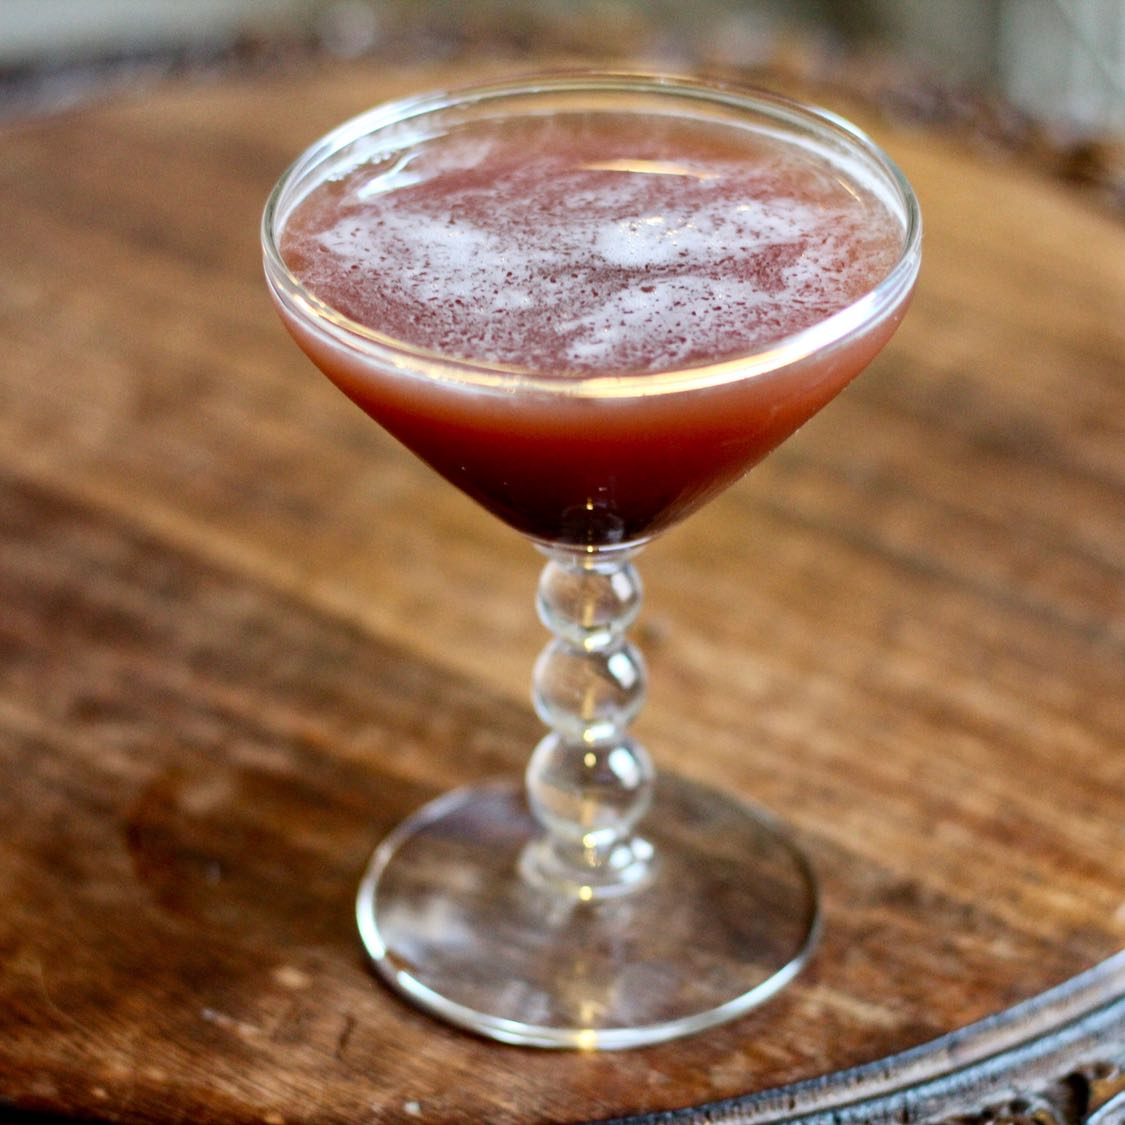 Blood and Sand Cocktail - Original 1934 Savoy Recipe